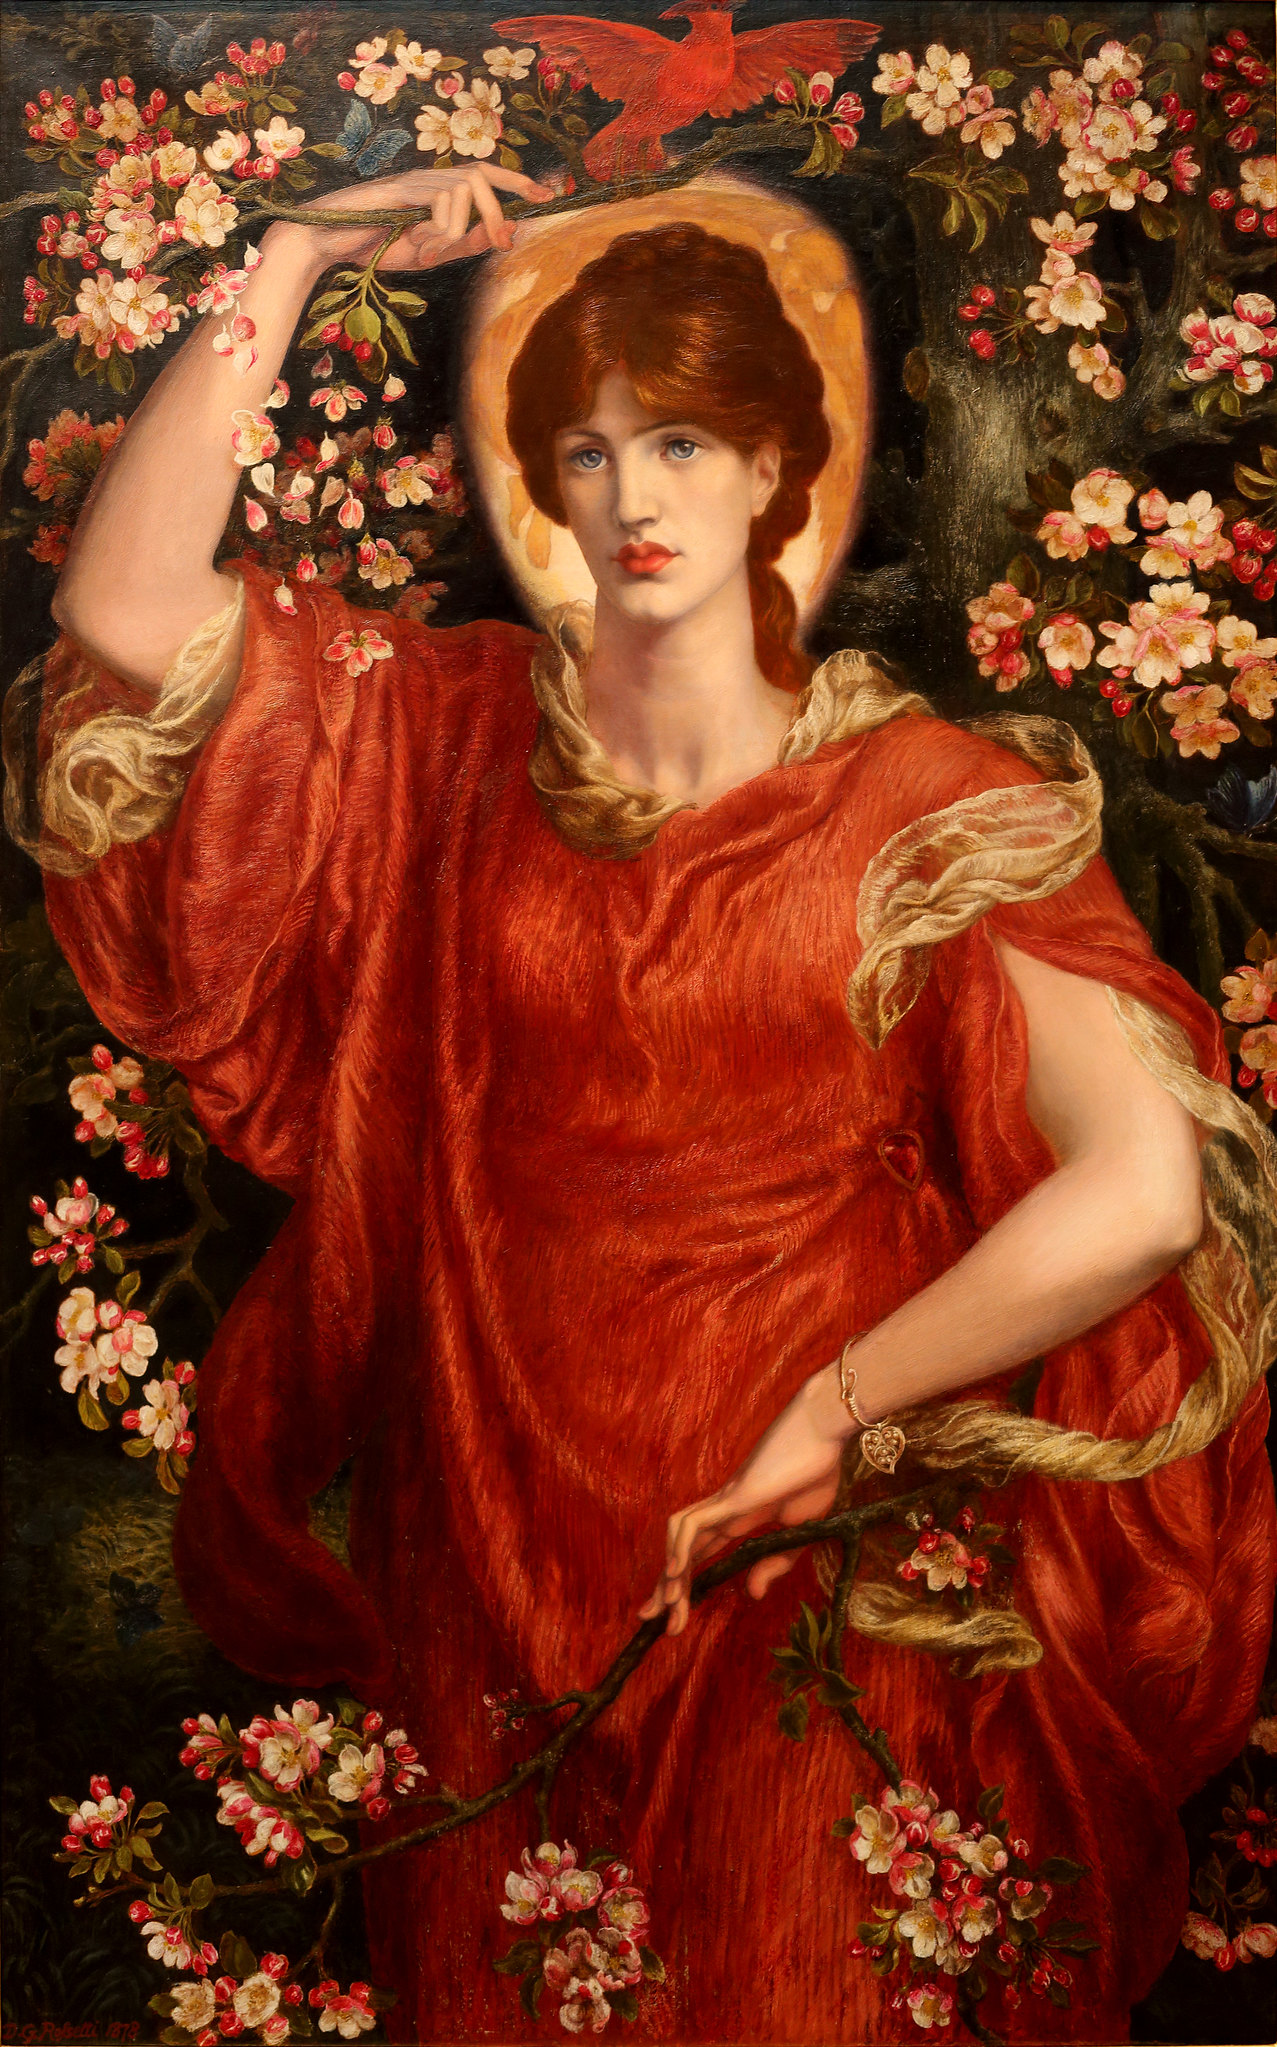 A Vision of Fiammetta by Dante Gabriel Rossetti, 1878